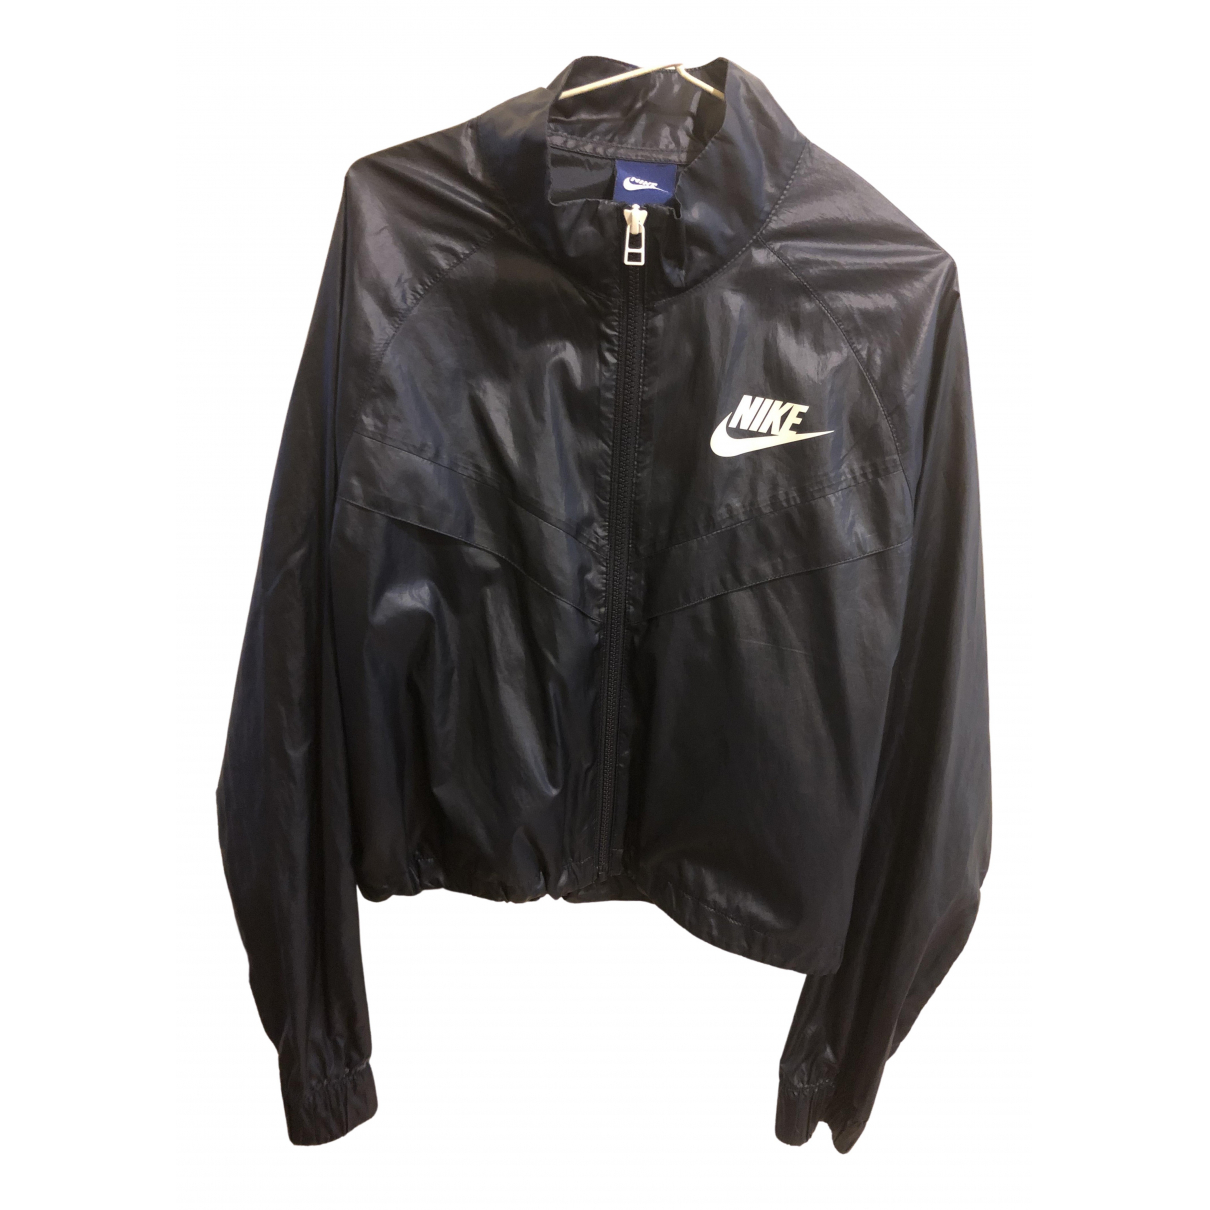 Nike \N Navy jacket for Women 36 FR